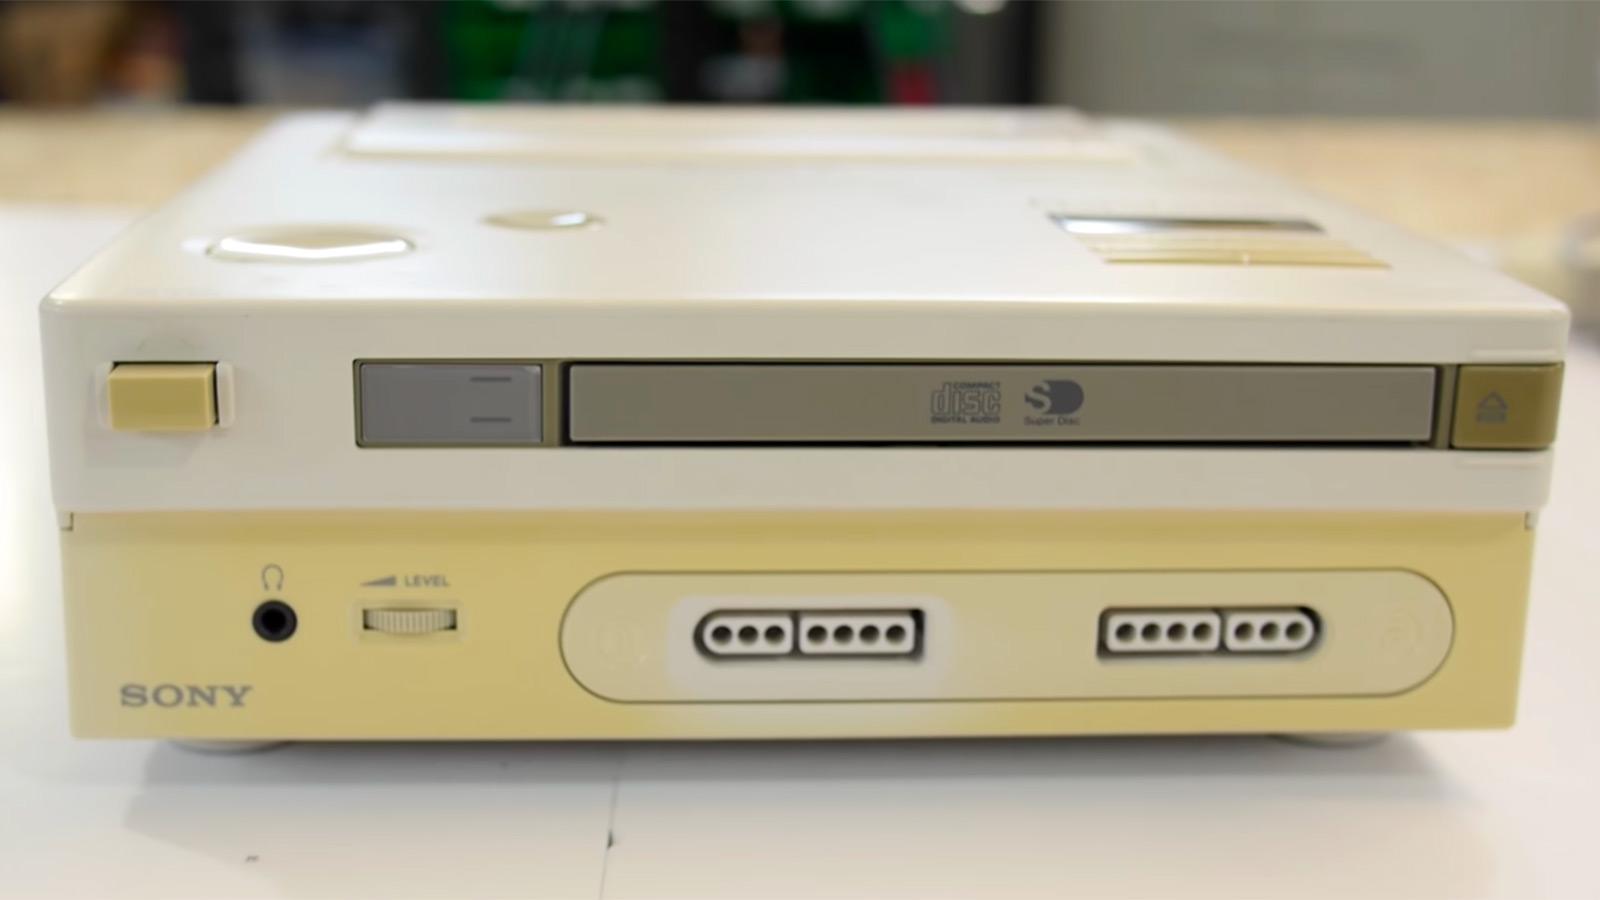 Ben Heck 拆解了传说中的 Sony Nintendo Play Station